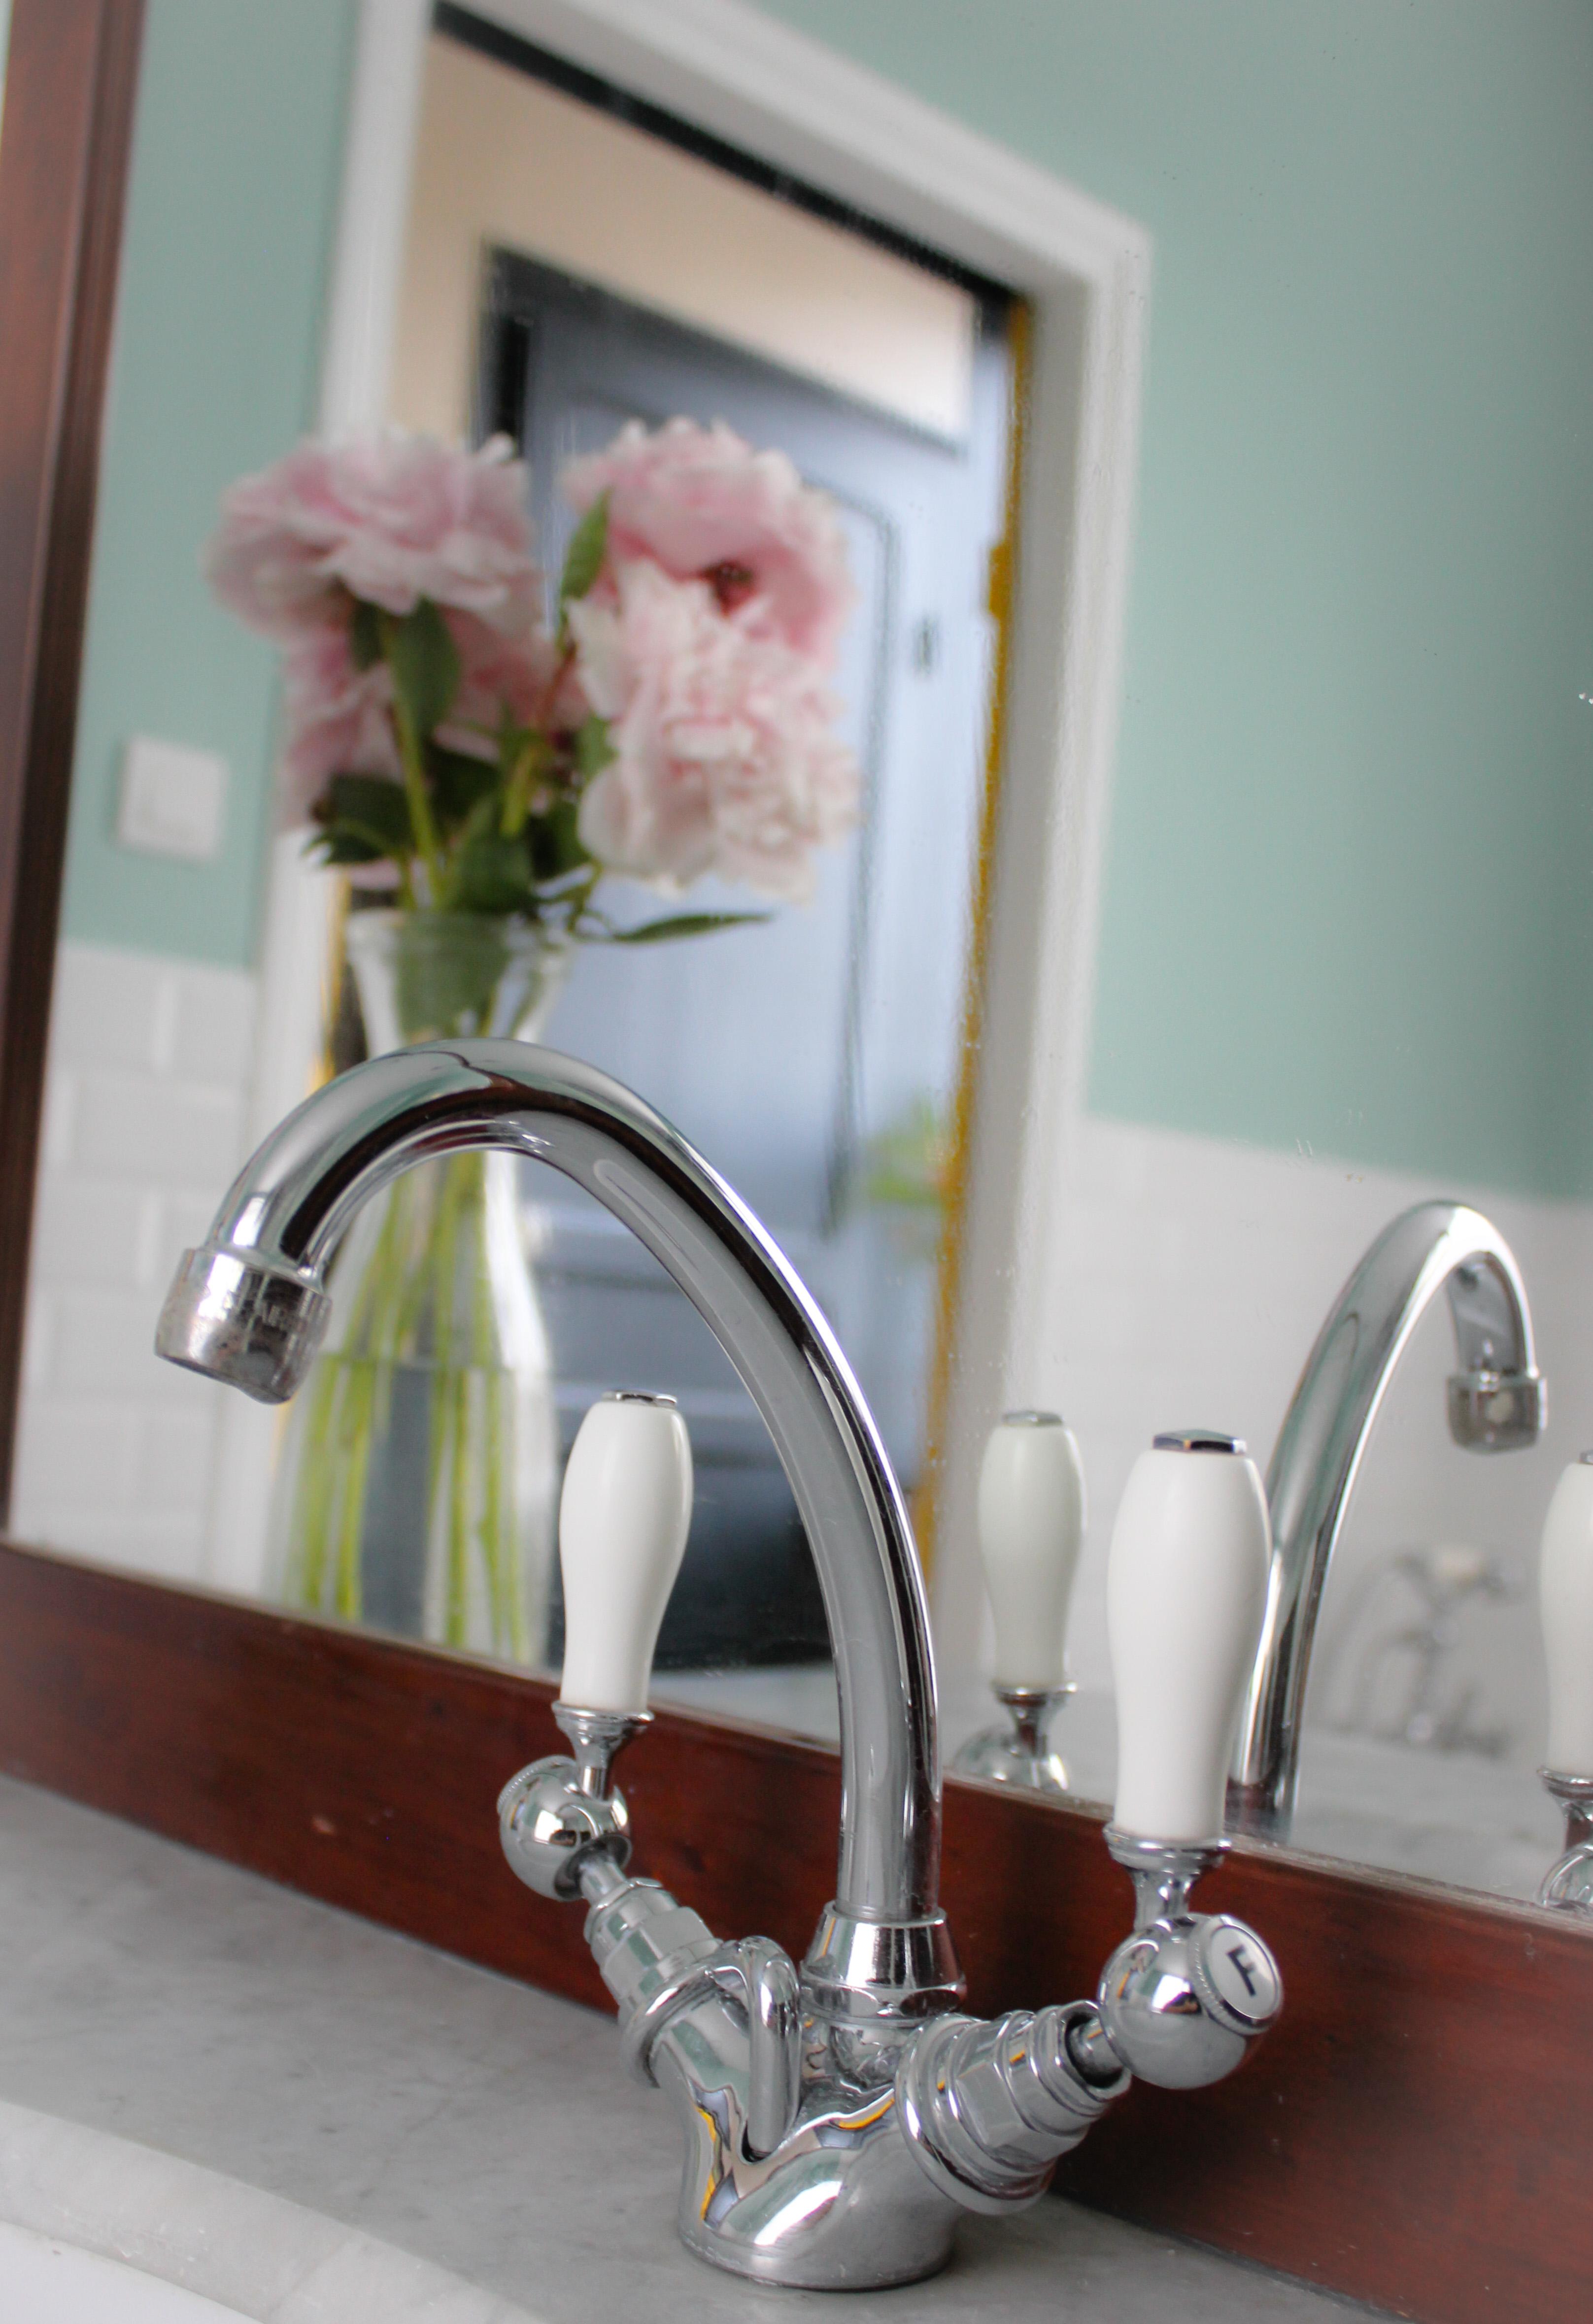 robinet vintage